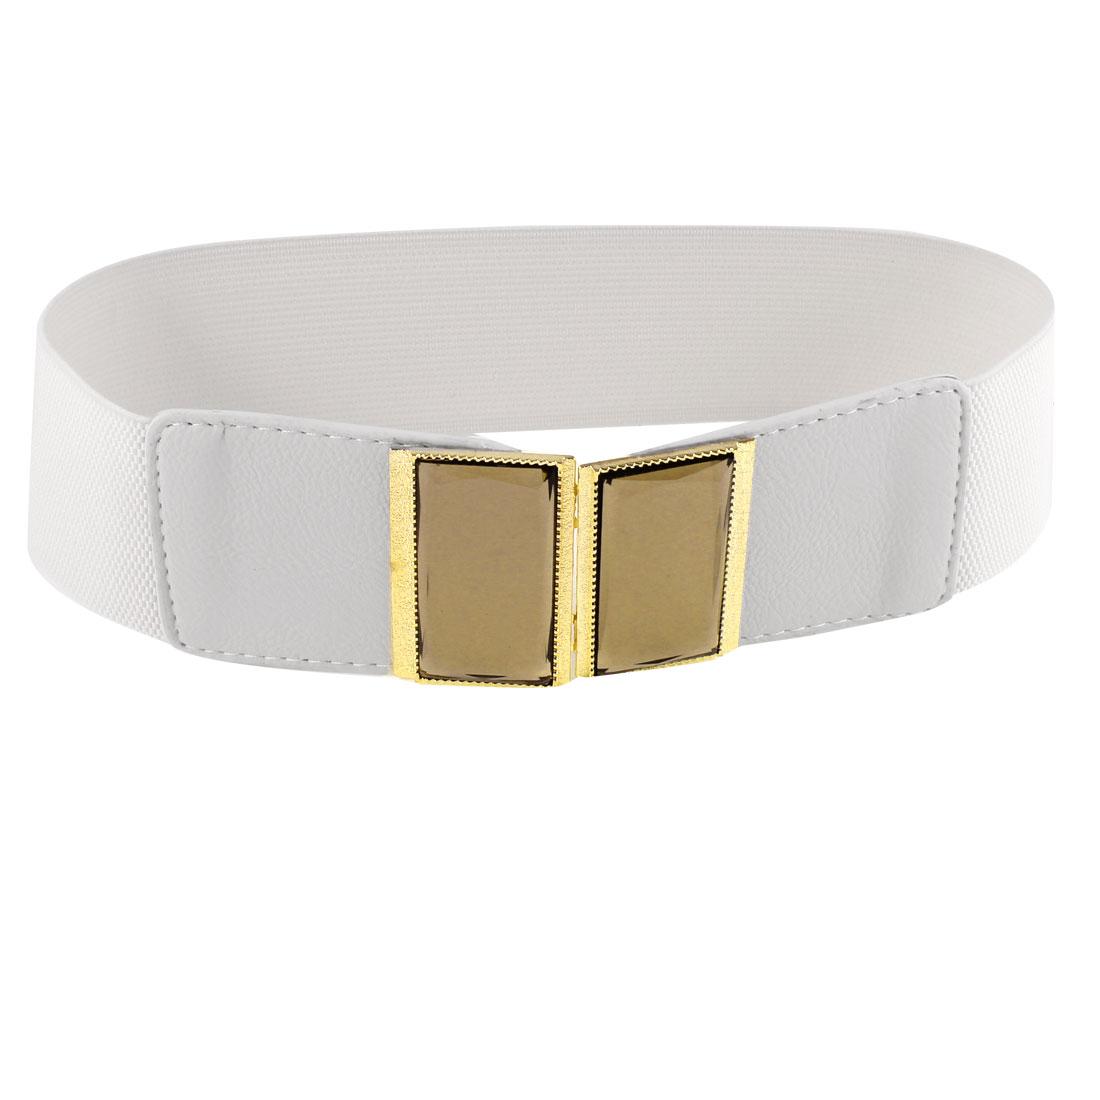 Women Plastic Crystal Accent Interlocking Buckle Stretchy Waist Belt White